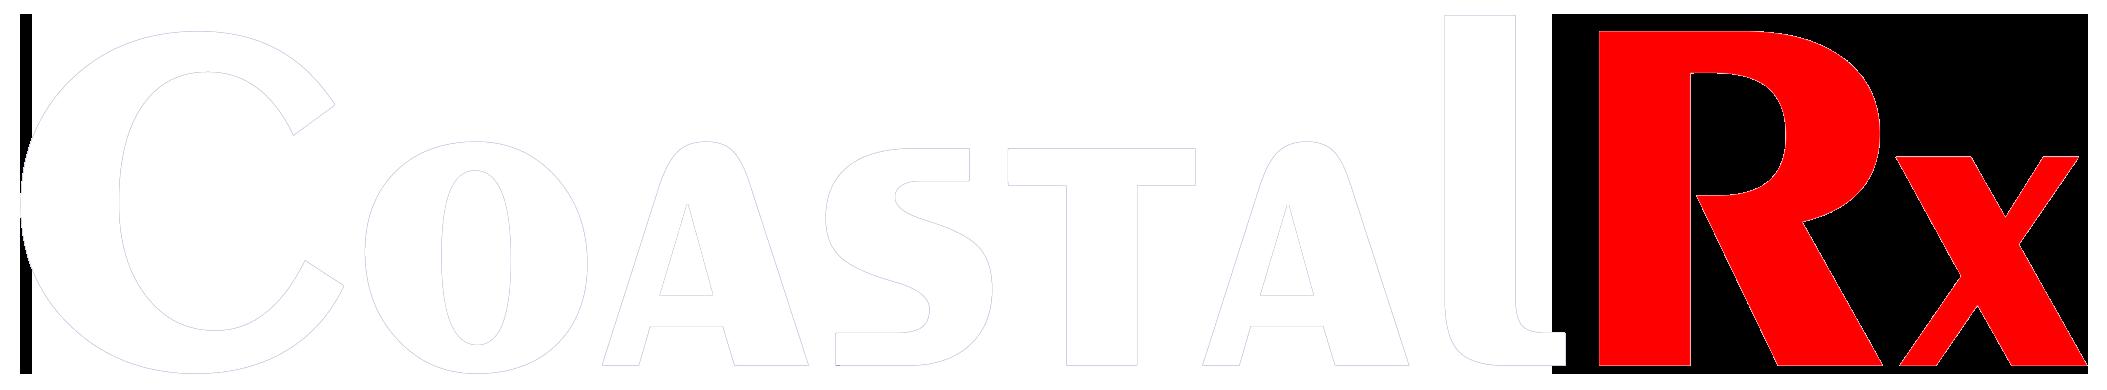 whiteblue-coastalrx